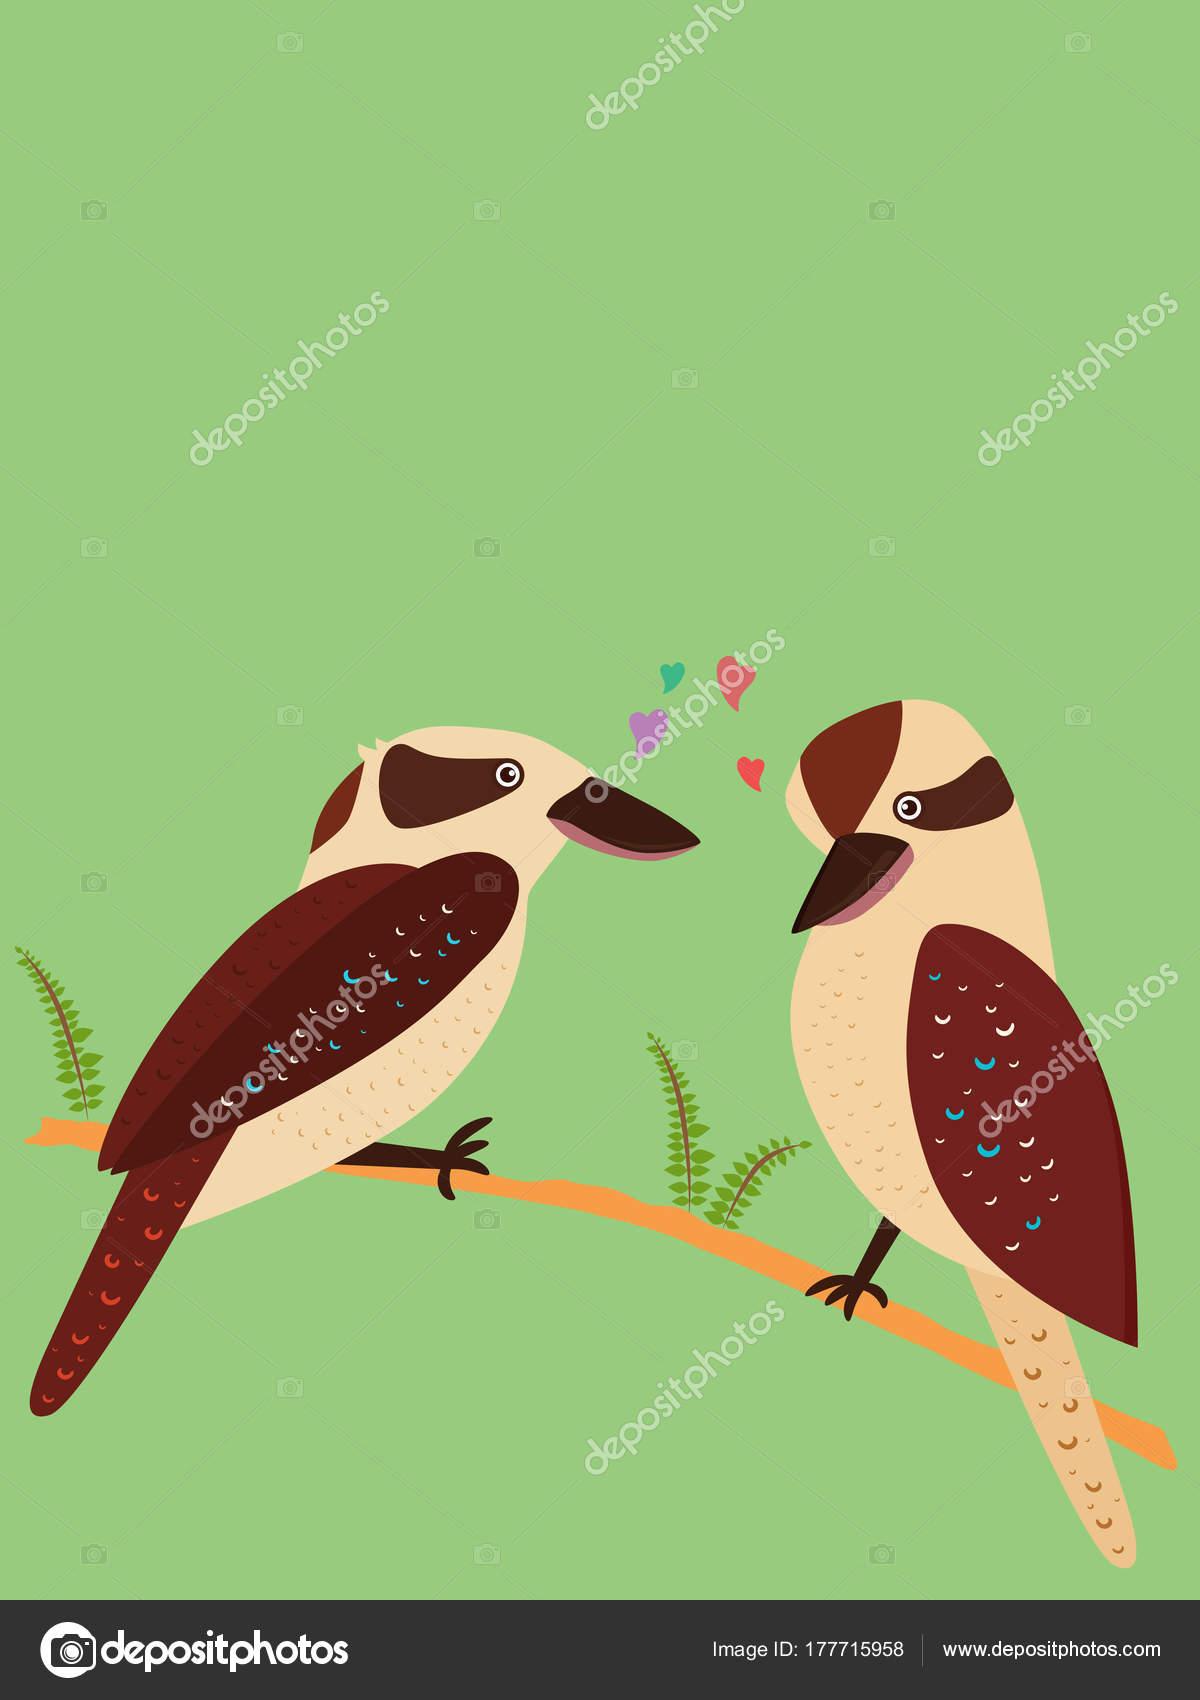 Romantic Love Birds Images